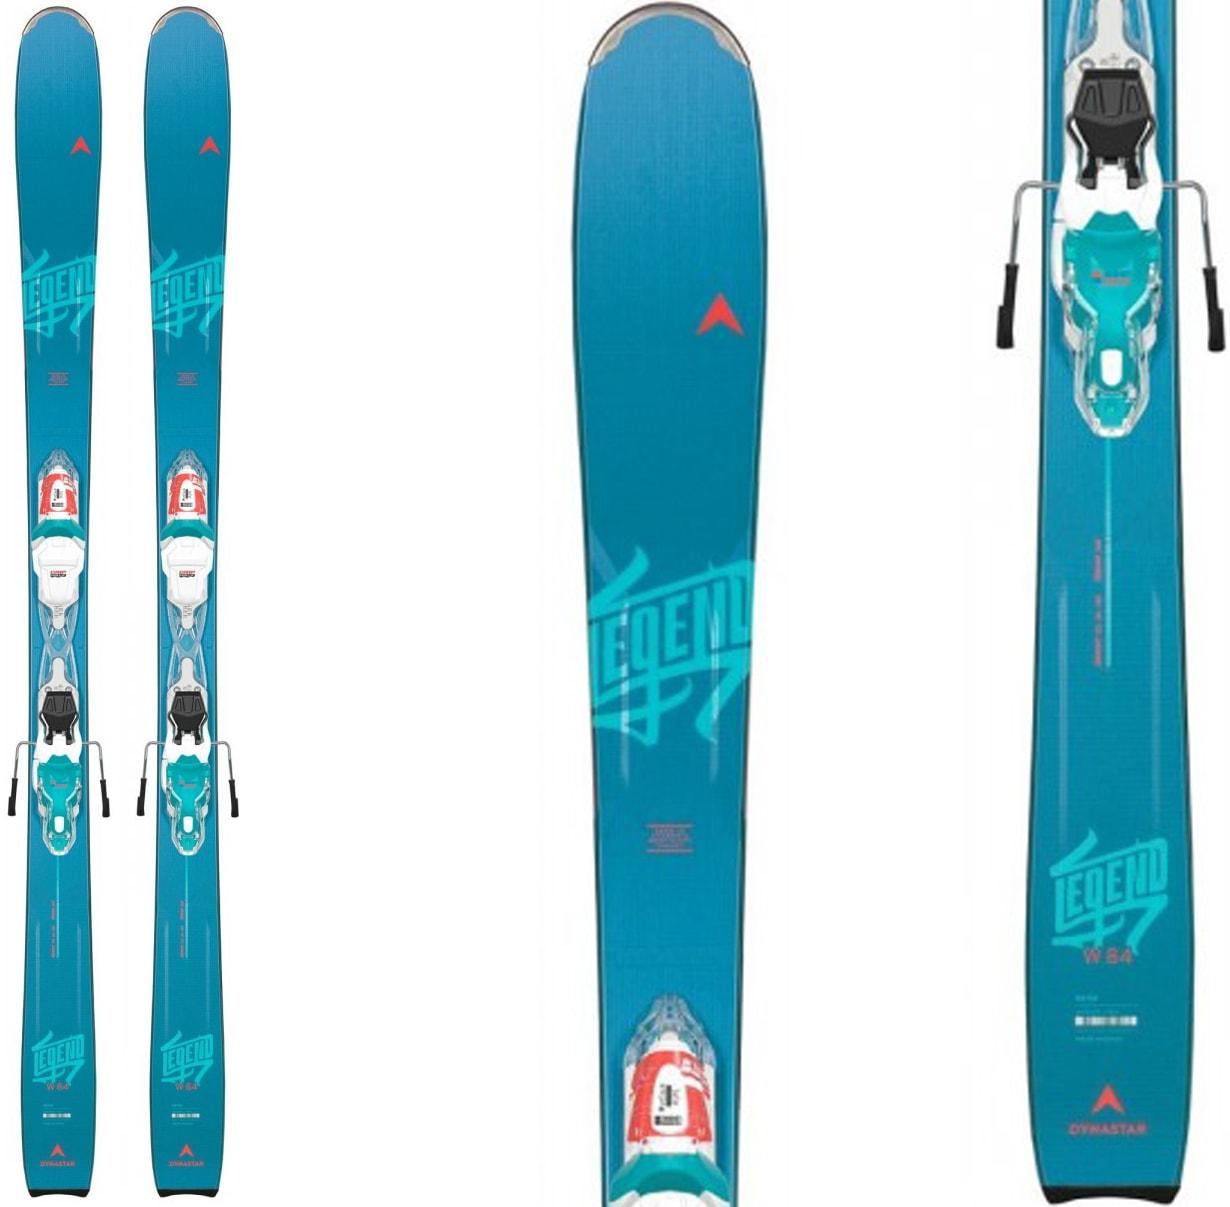 Dynastar Legend 84 Skis W/ Xpress W 10 GW Bindings